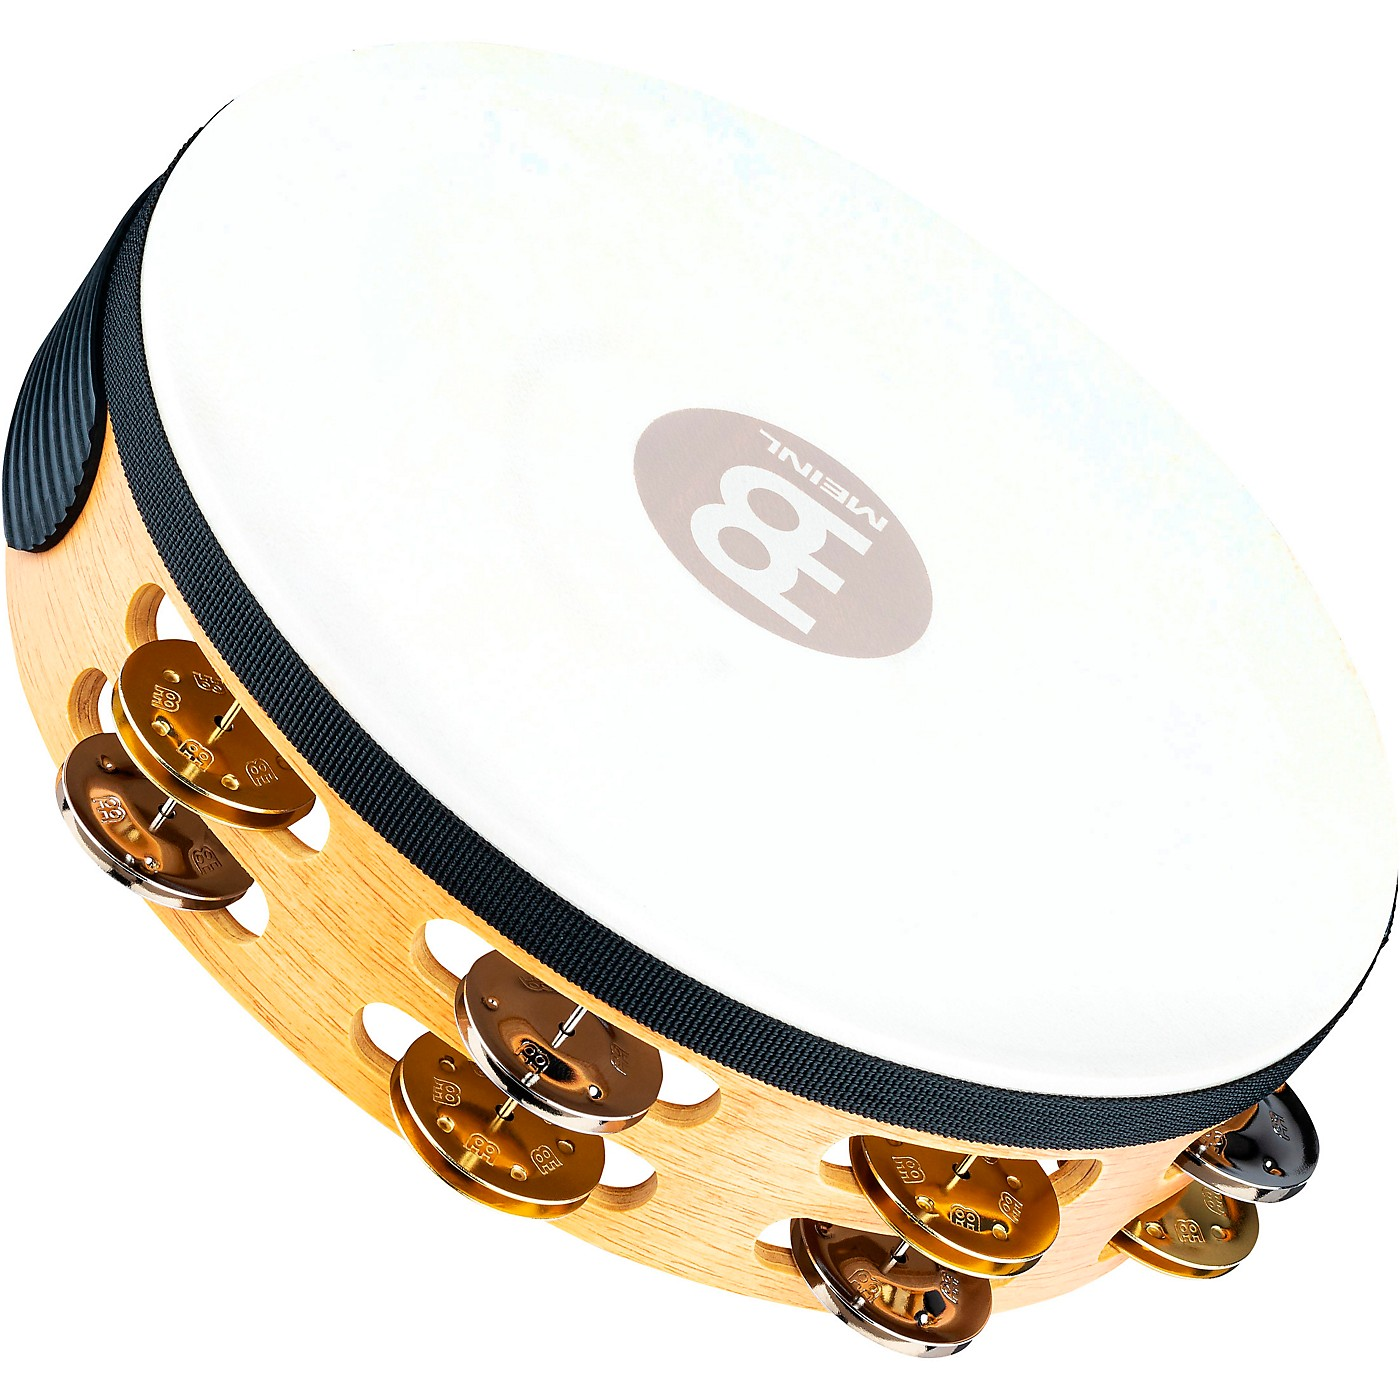 Meinl Recording-Combo Goat-Skin Wood Tambourine Two Rows Dual Alloy Jingles thumbnail